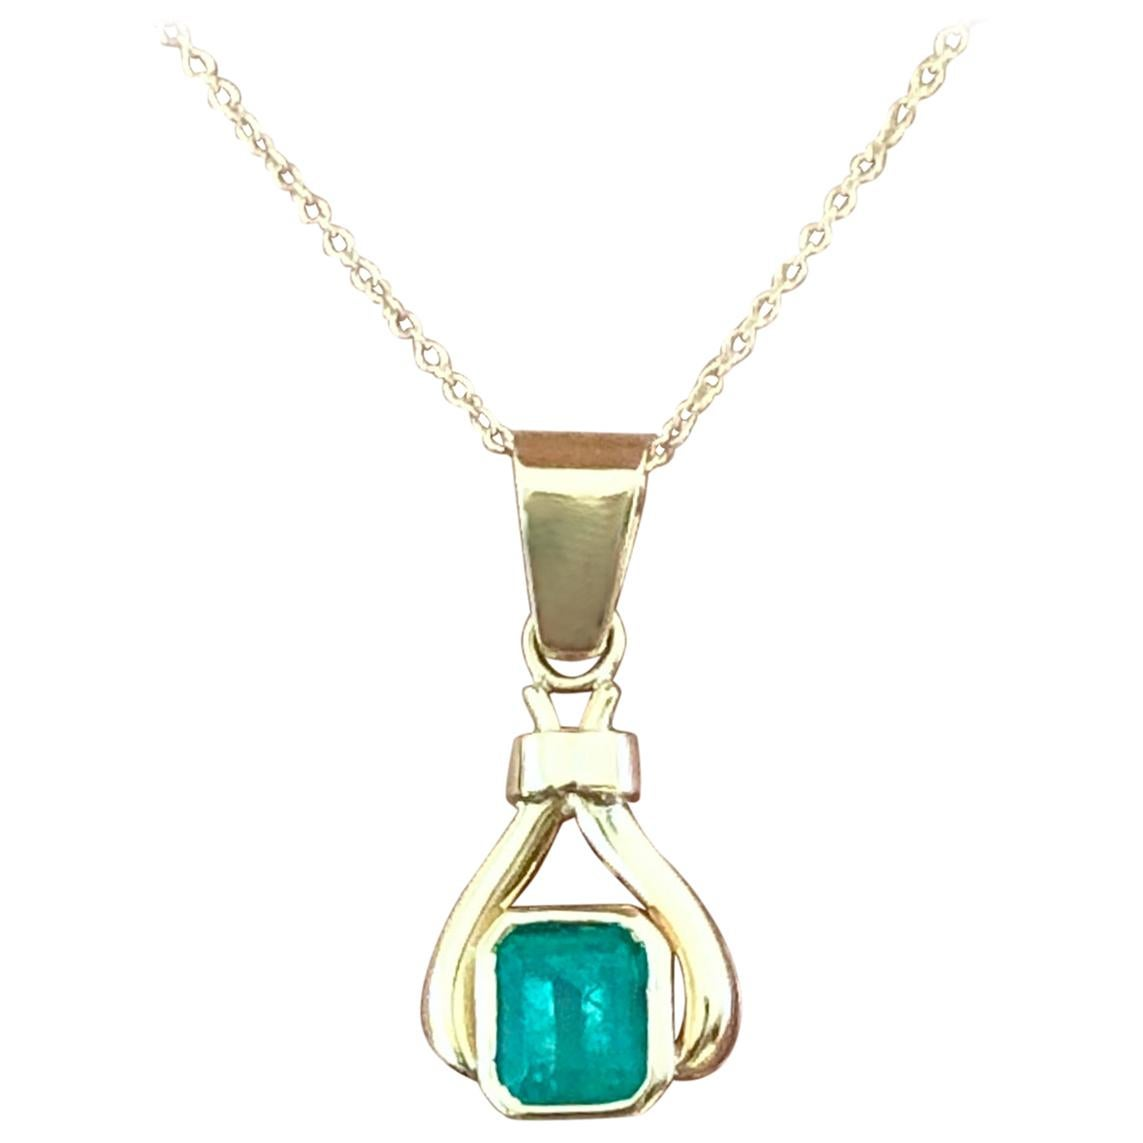 1.00 Carat Natural Colombian Emerald Drop Pendant  18 Karat